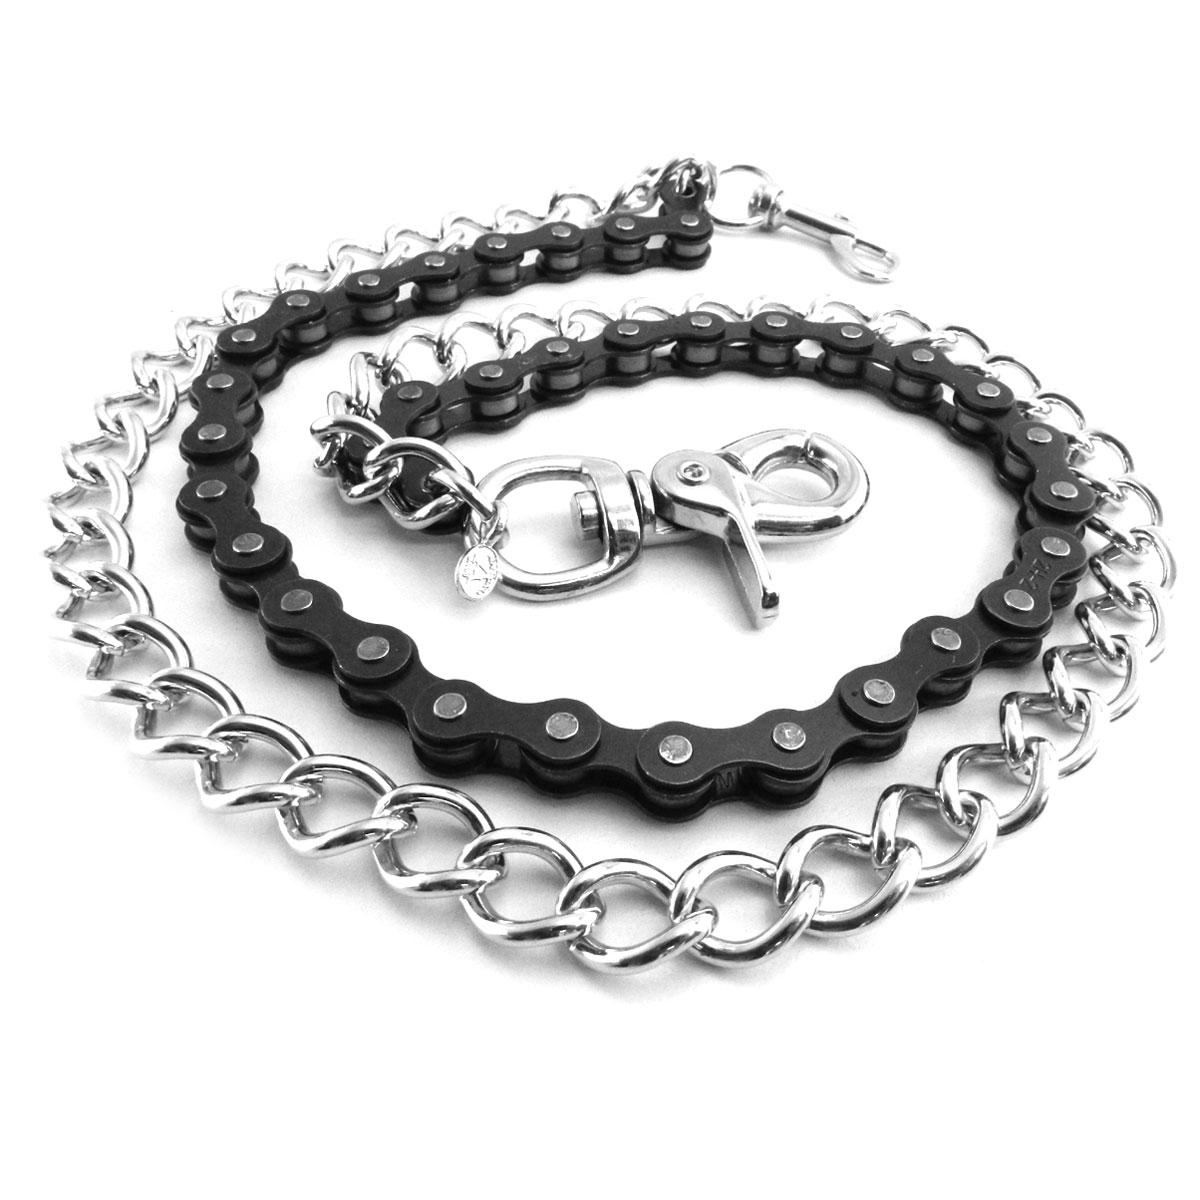 AMiGAZ Black Bike Chain 18″ & Shackle 23″ Double Wallet Chain